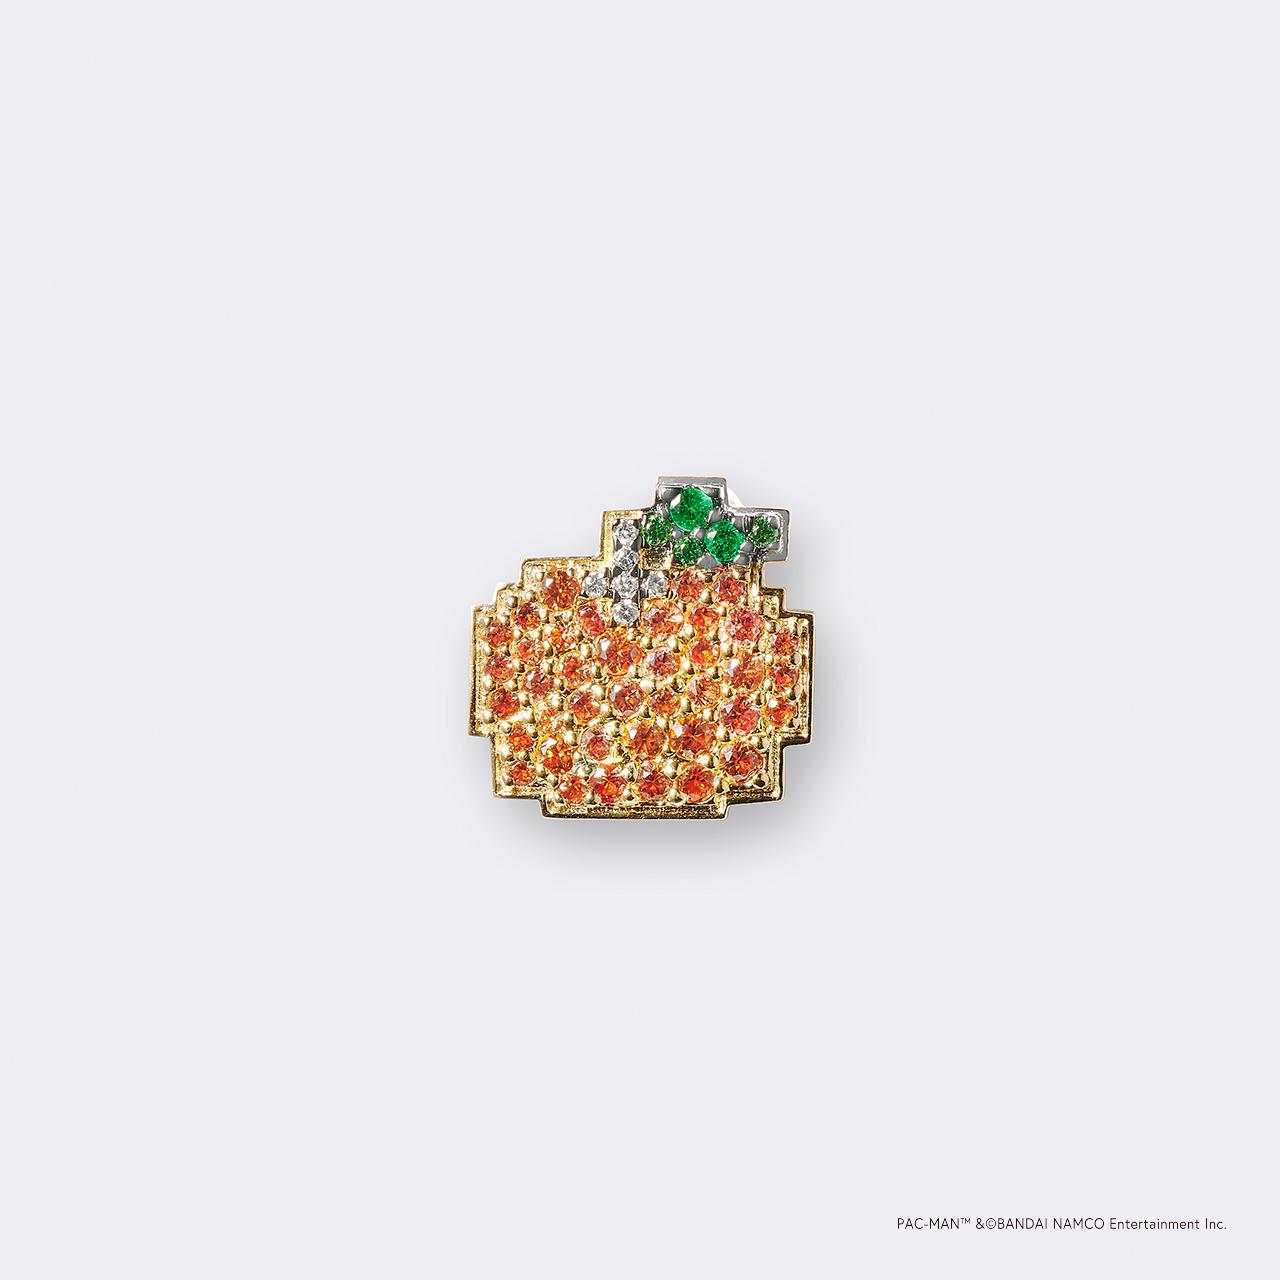 PAC-MAN  (パックマン) K18YG・ボーナスフルーツ オレンジ/ グリーンガーネット オレンジサファイア ・ダイヤモンドピンバッジ